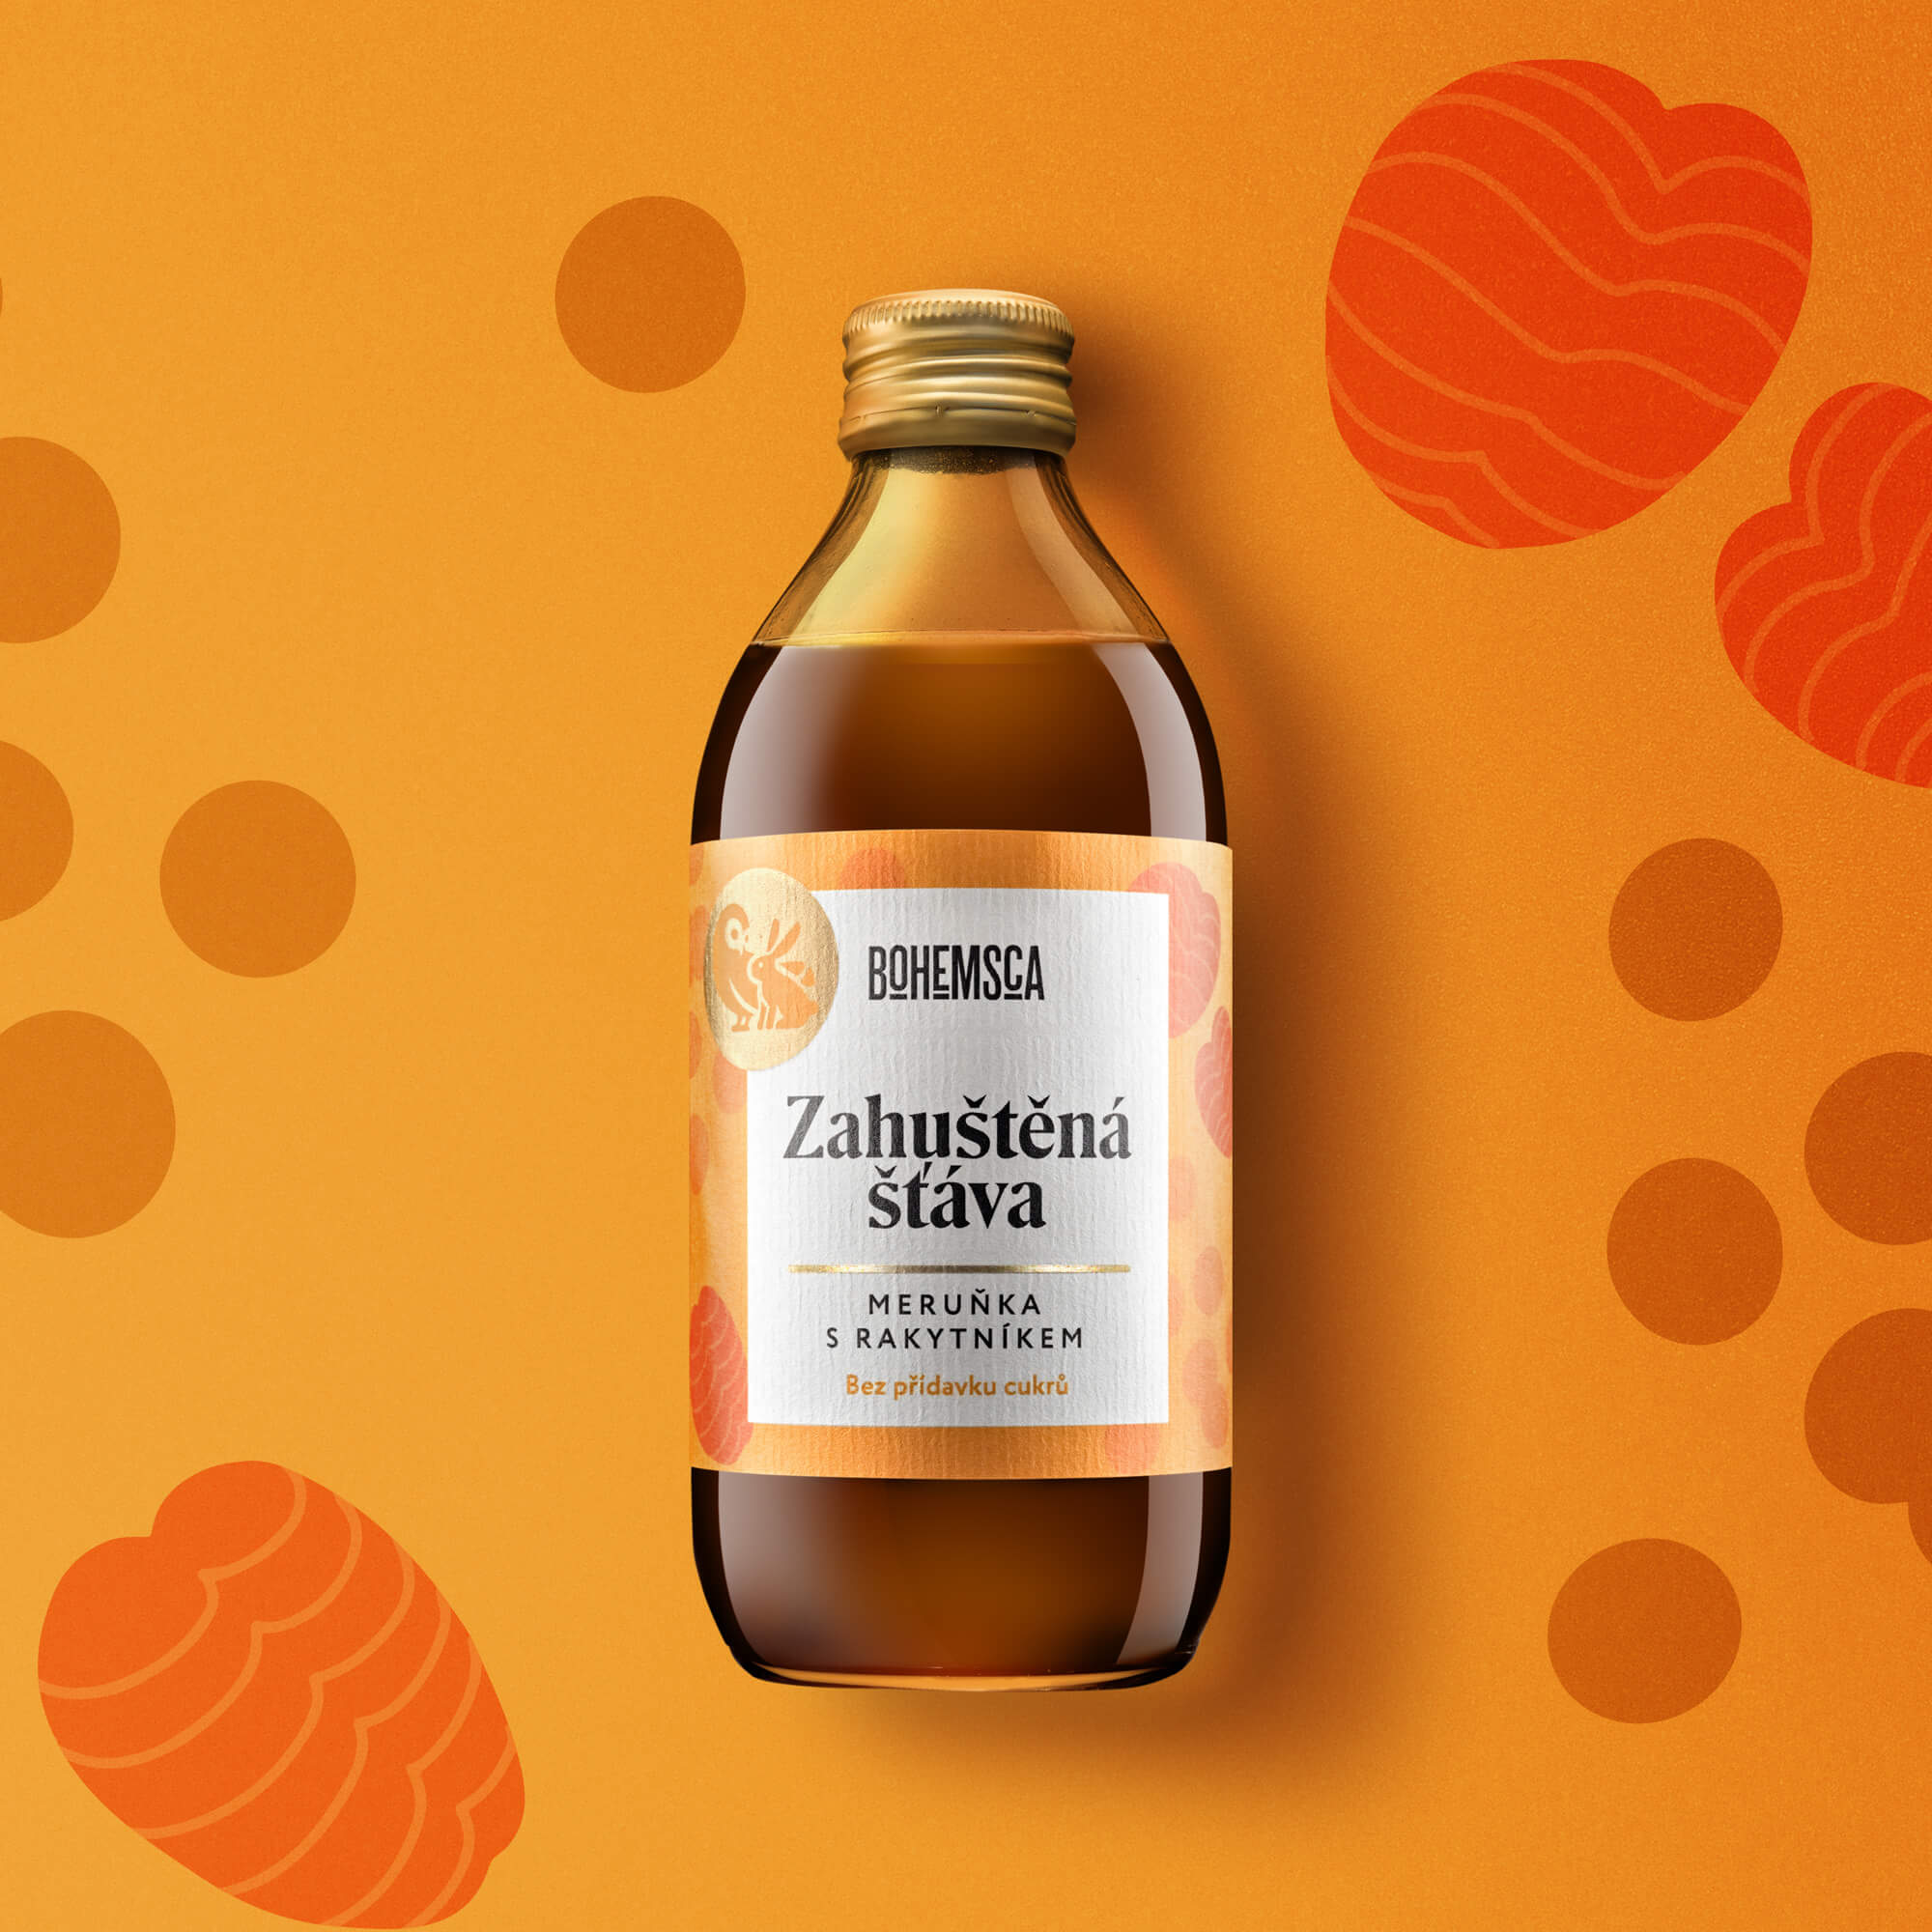 Bohemsca syrup packaging design